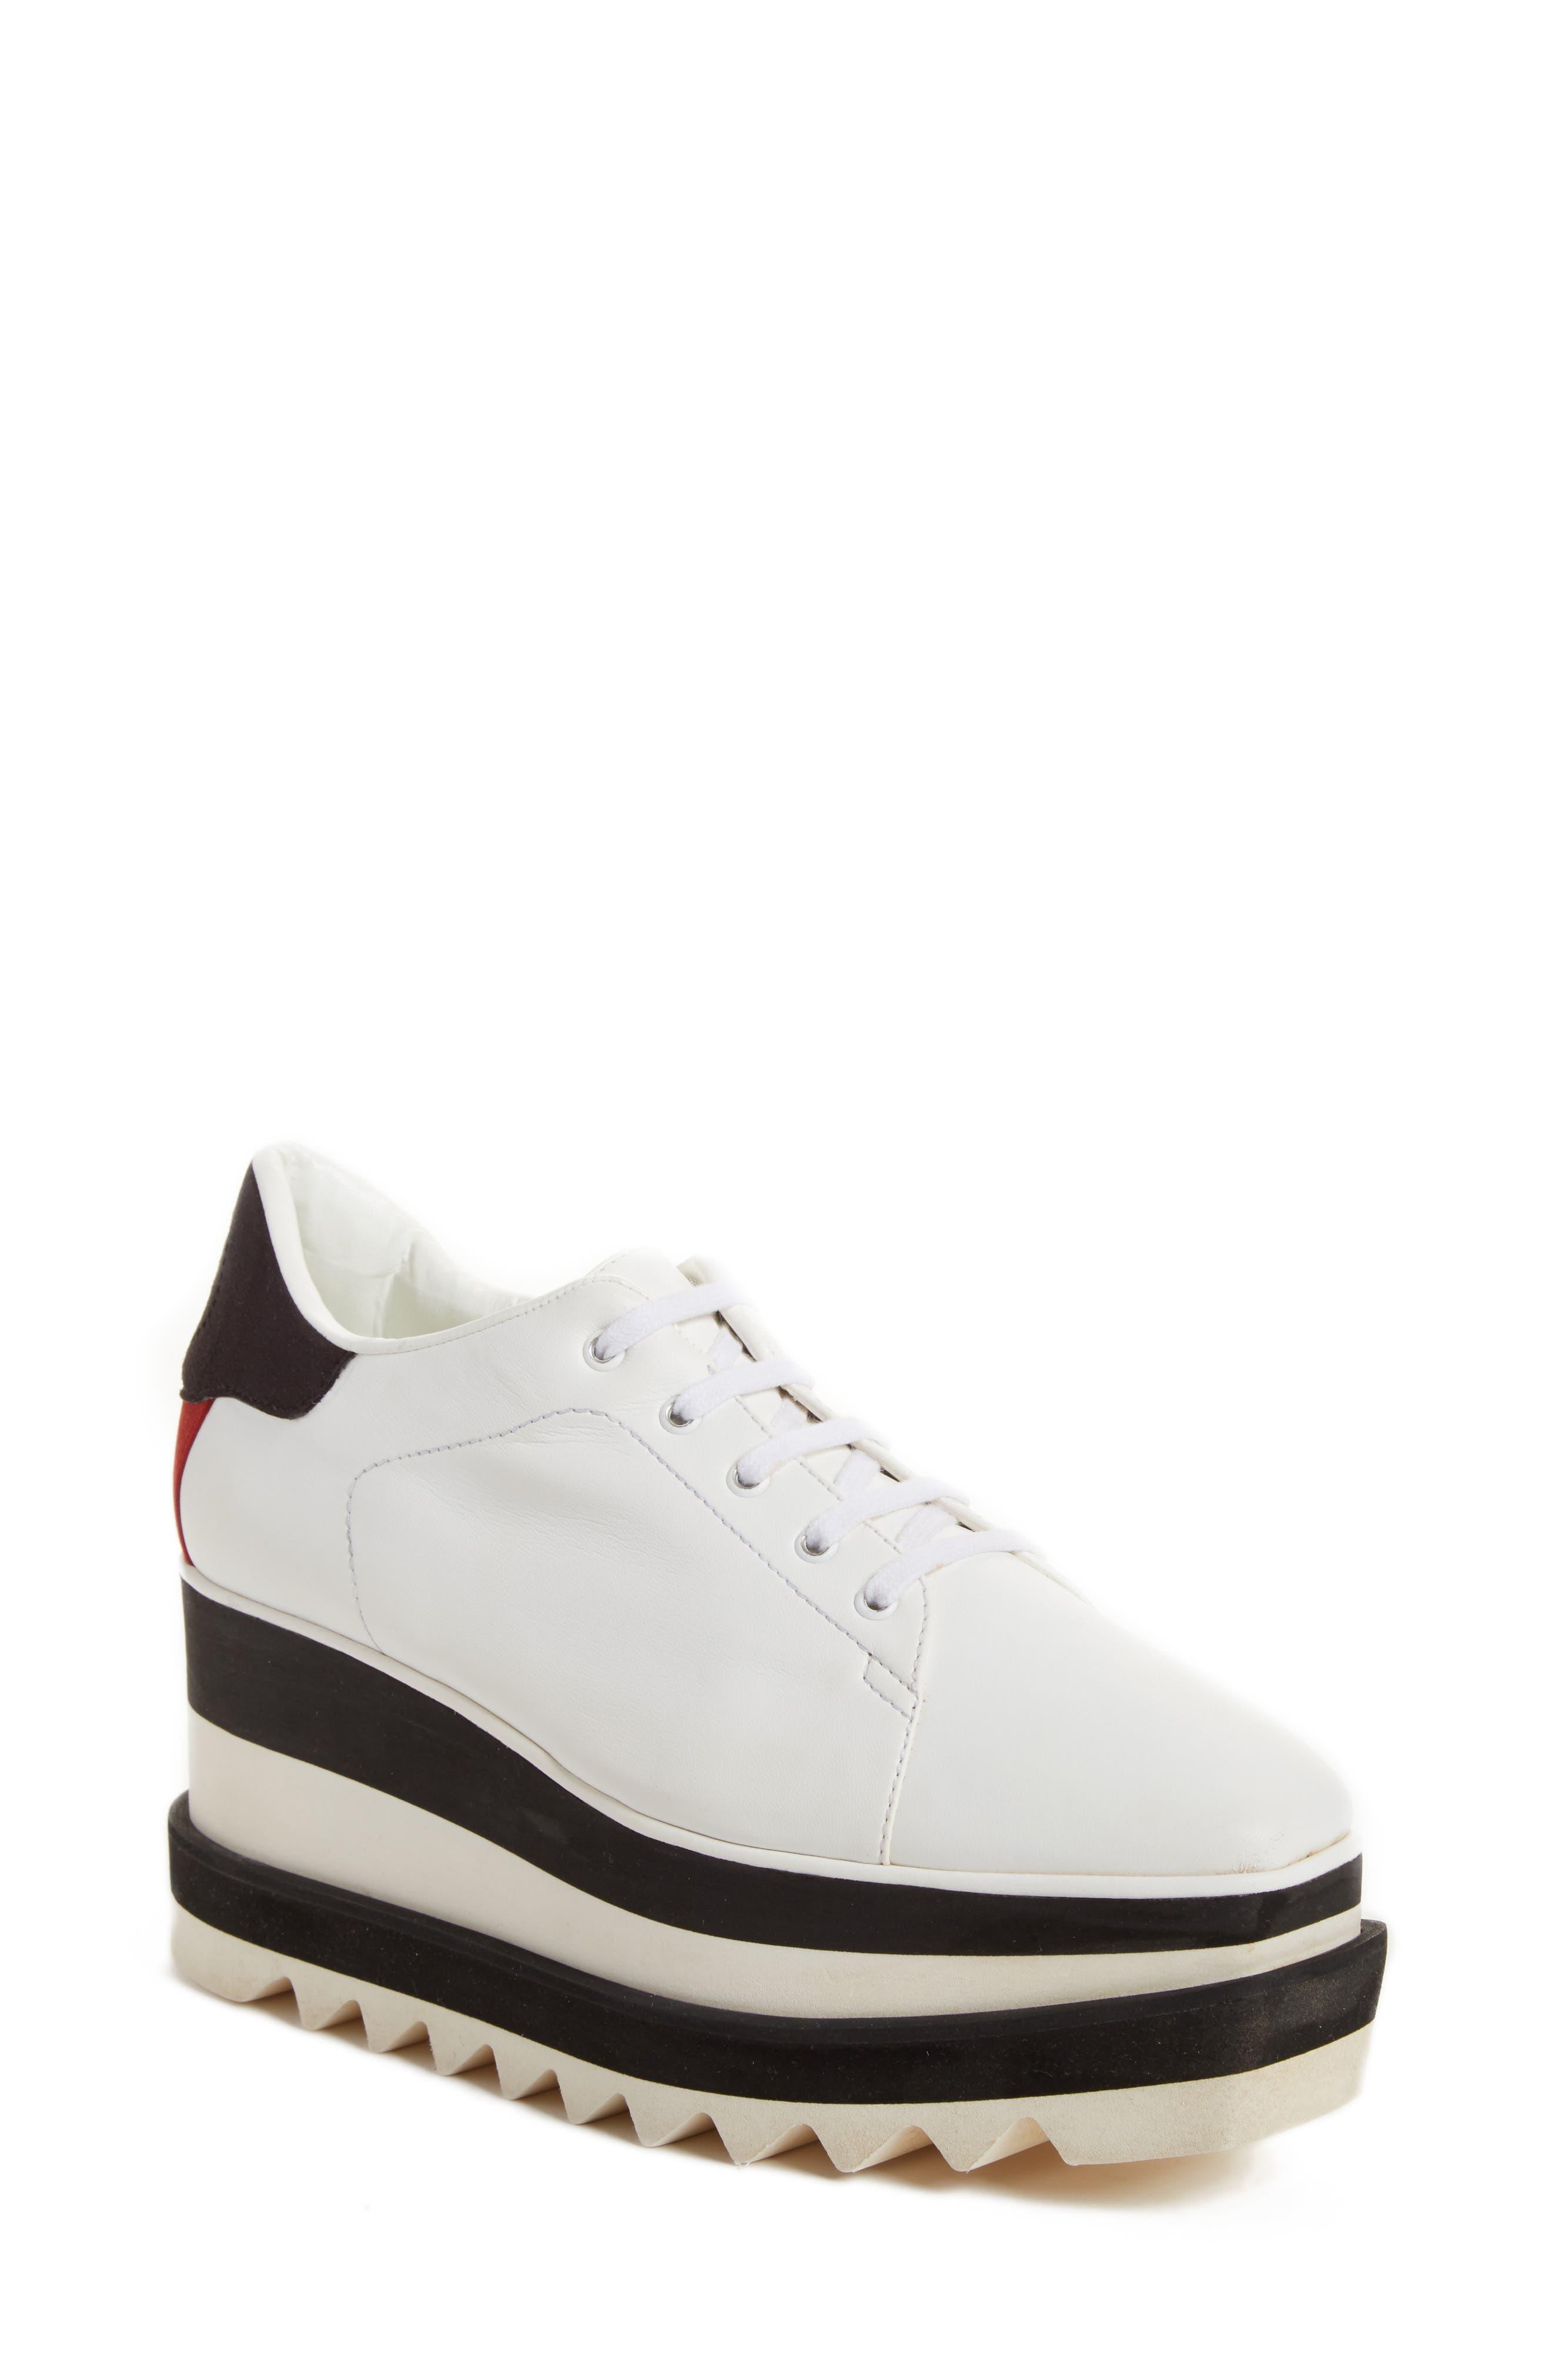 Alternate Image 1 Selected - Stella McCartney Sneak-Elyse Flatform Sneaker (Women)